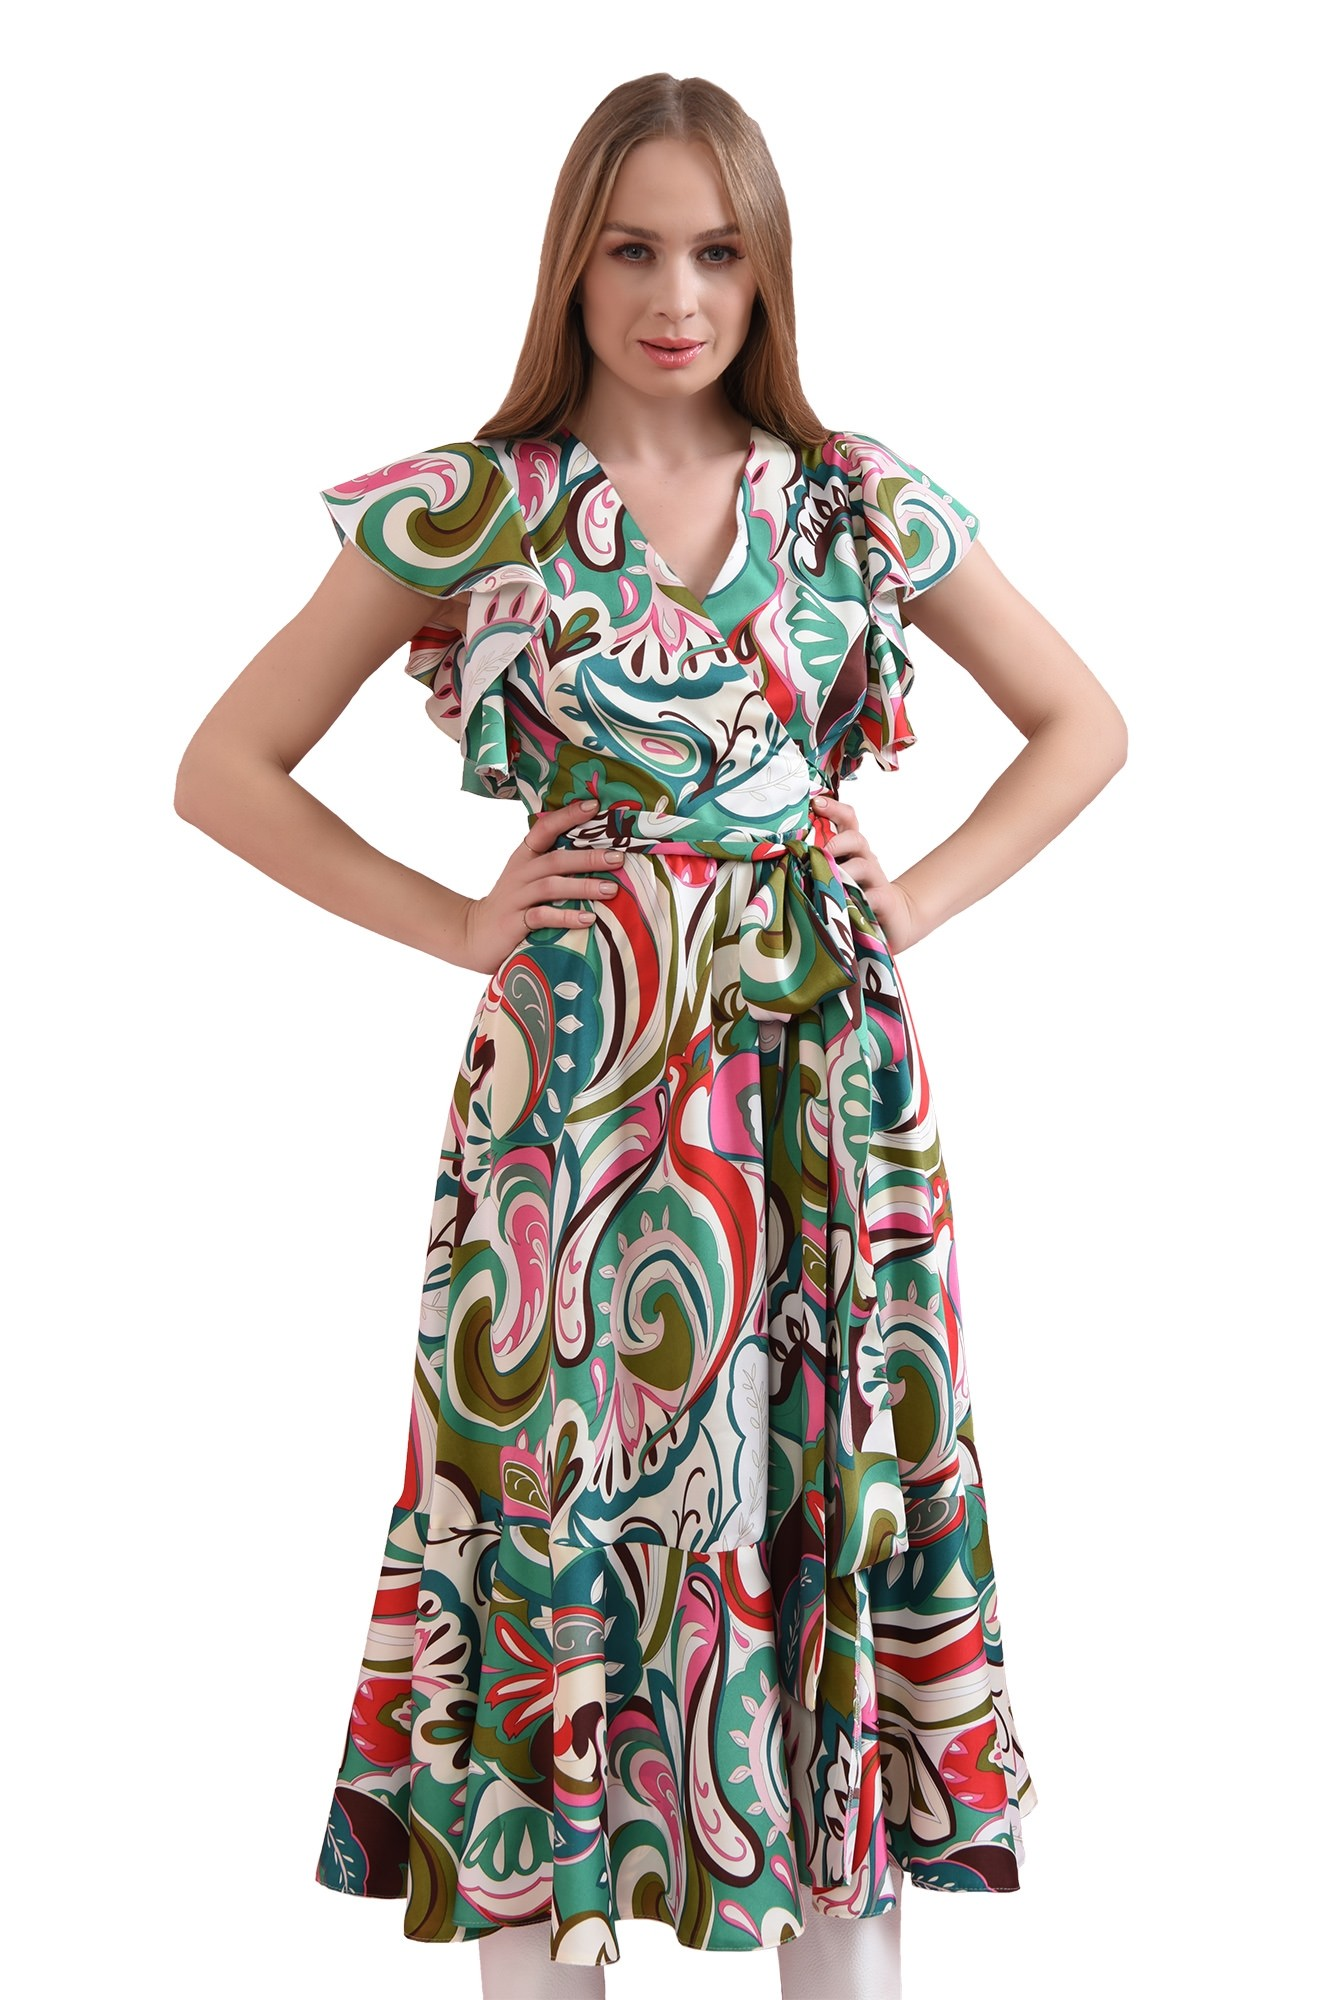 3 - rochie cu print multicolor, petrecuta